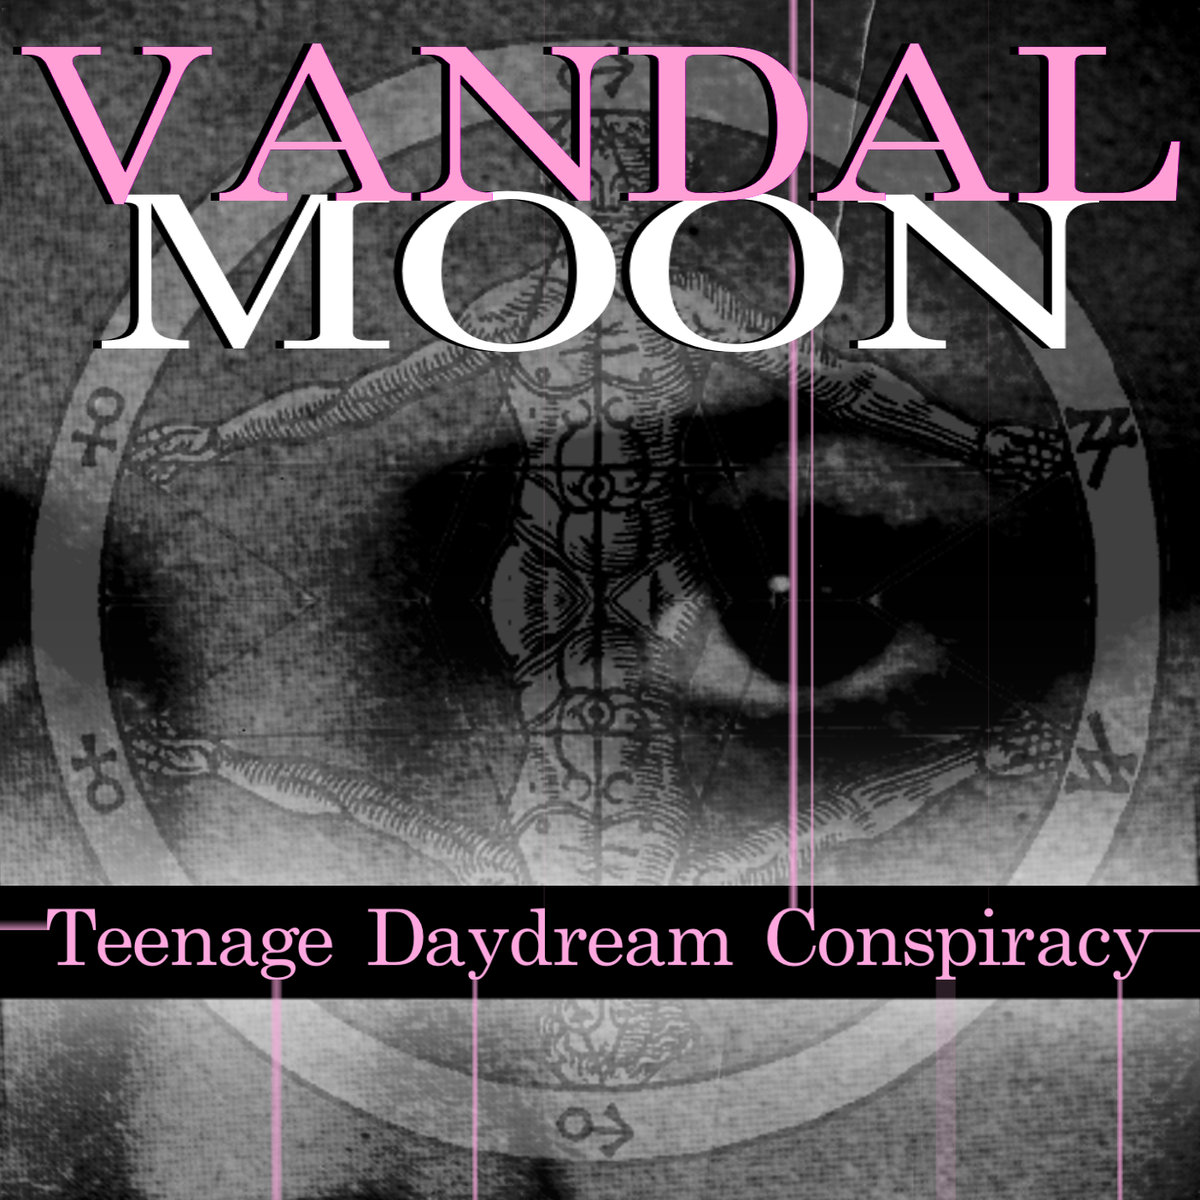 Teenage Daydream Conspiracy